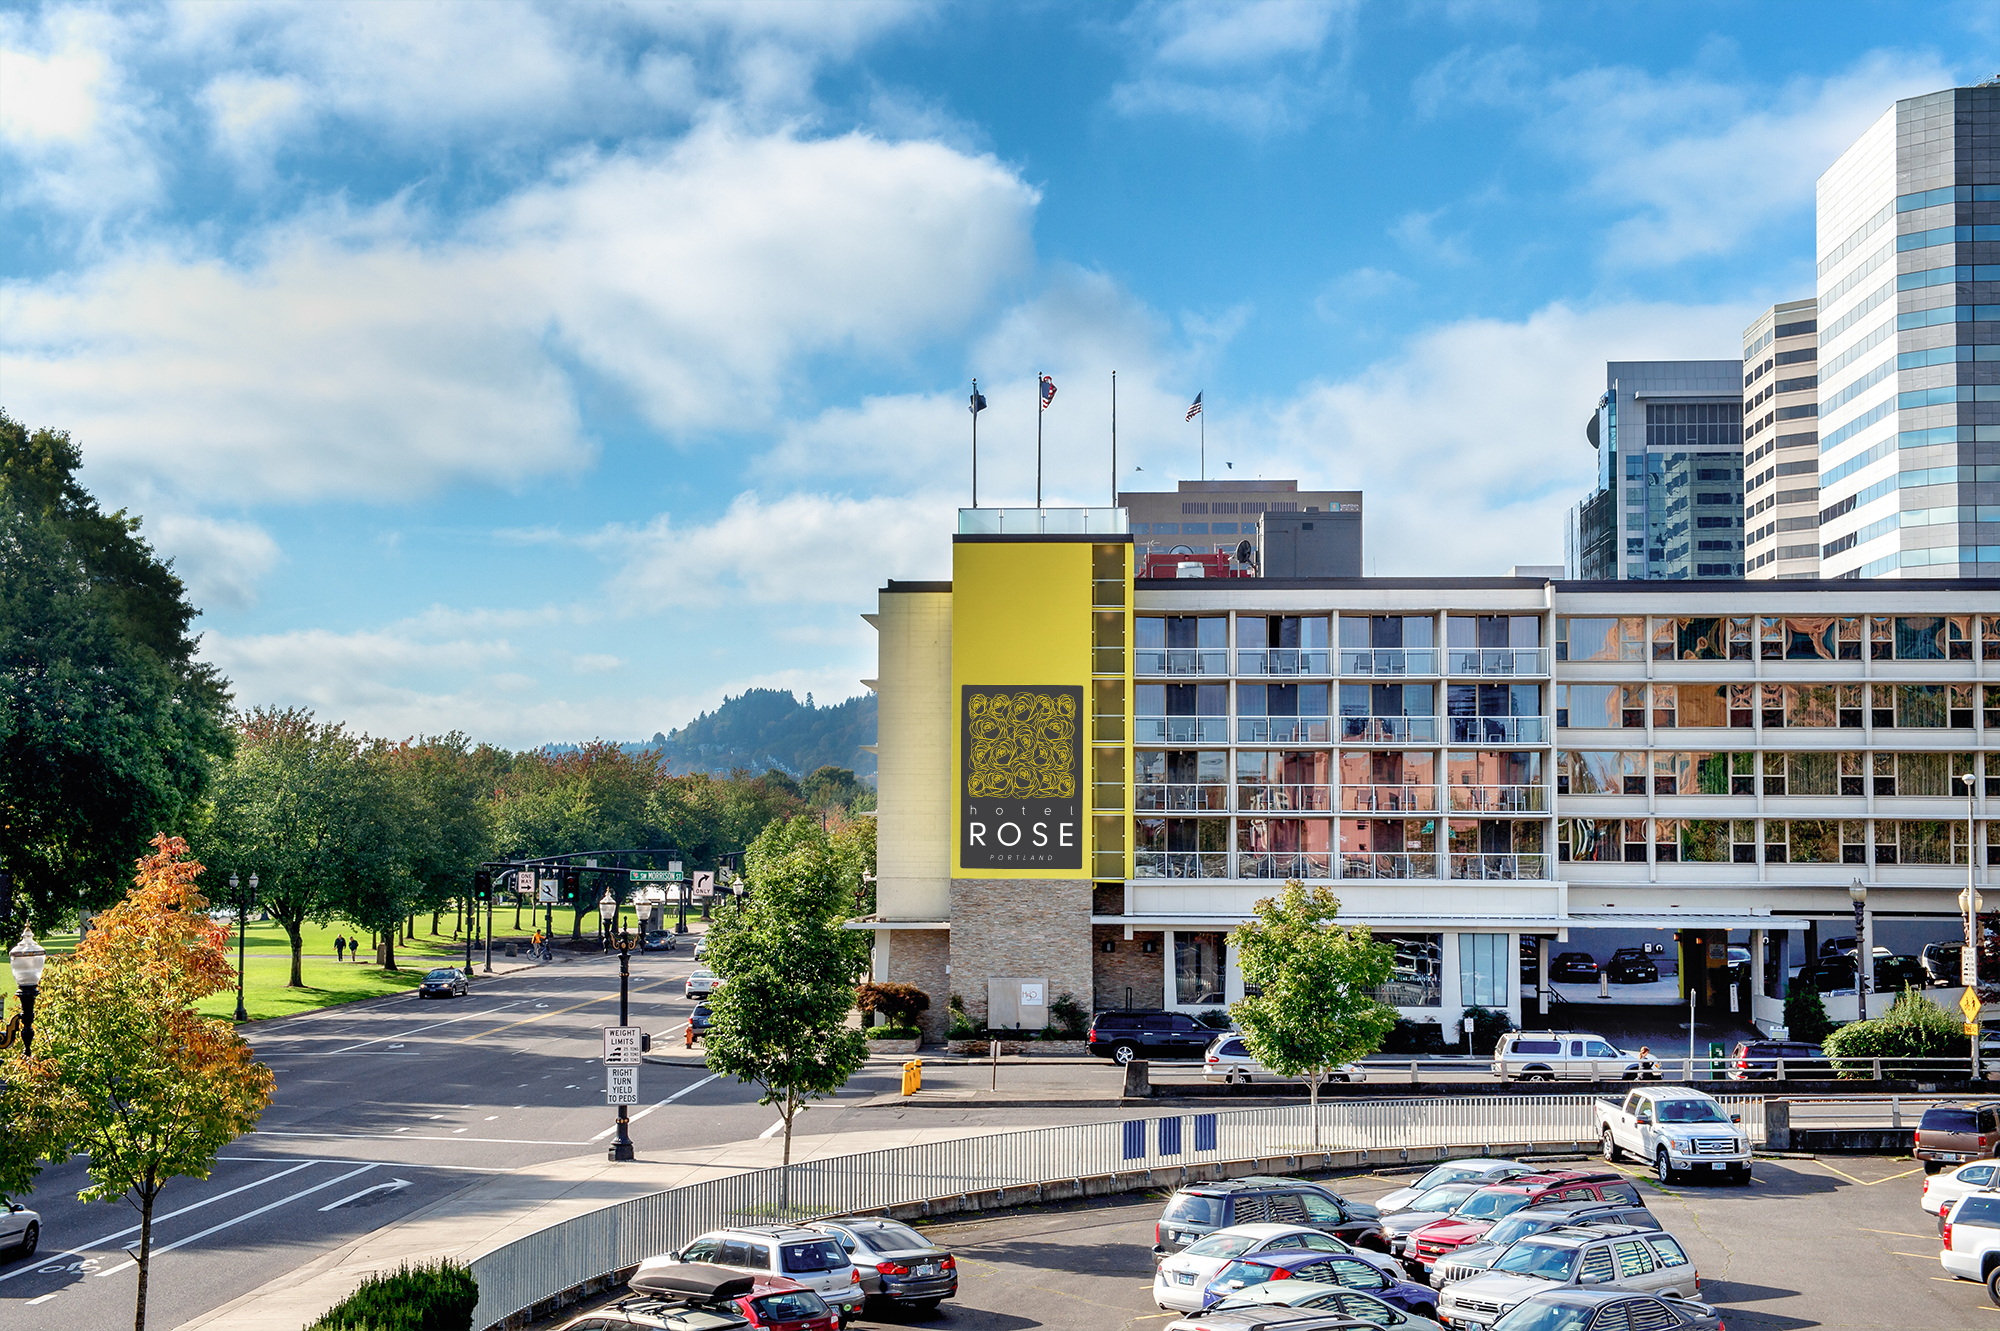 Hotel Rose - Portland, OR